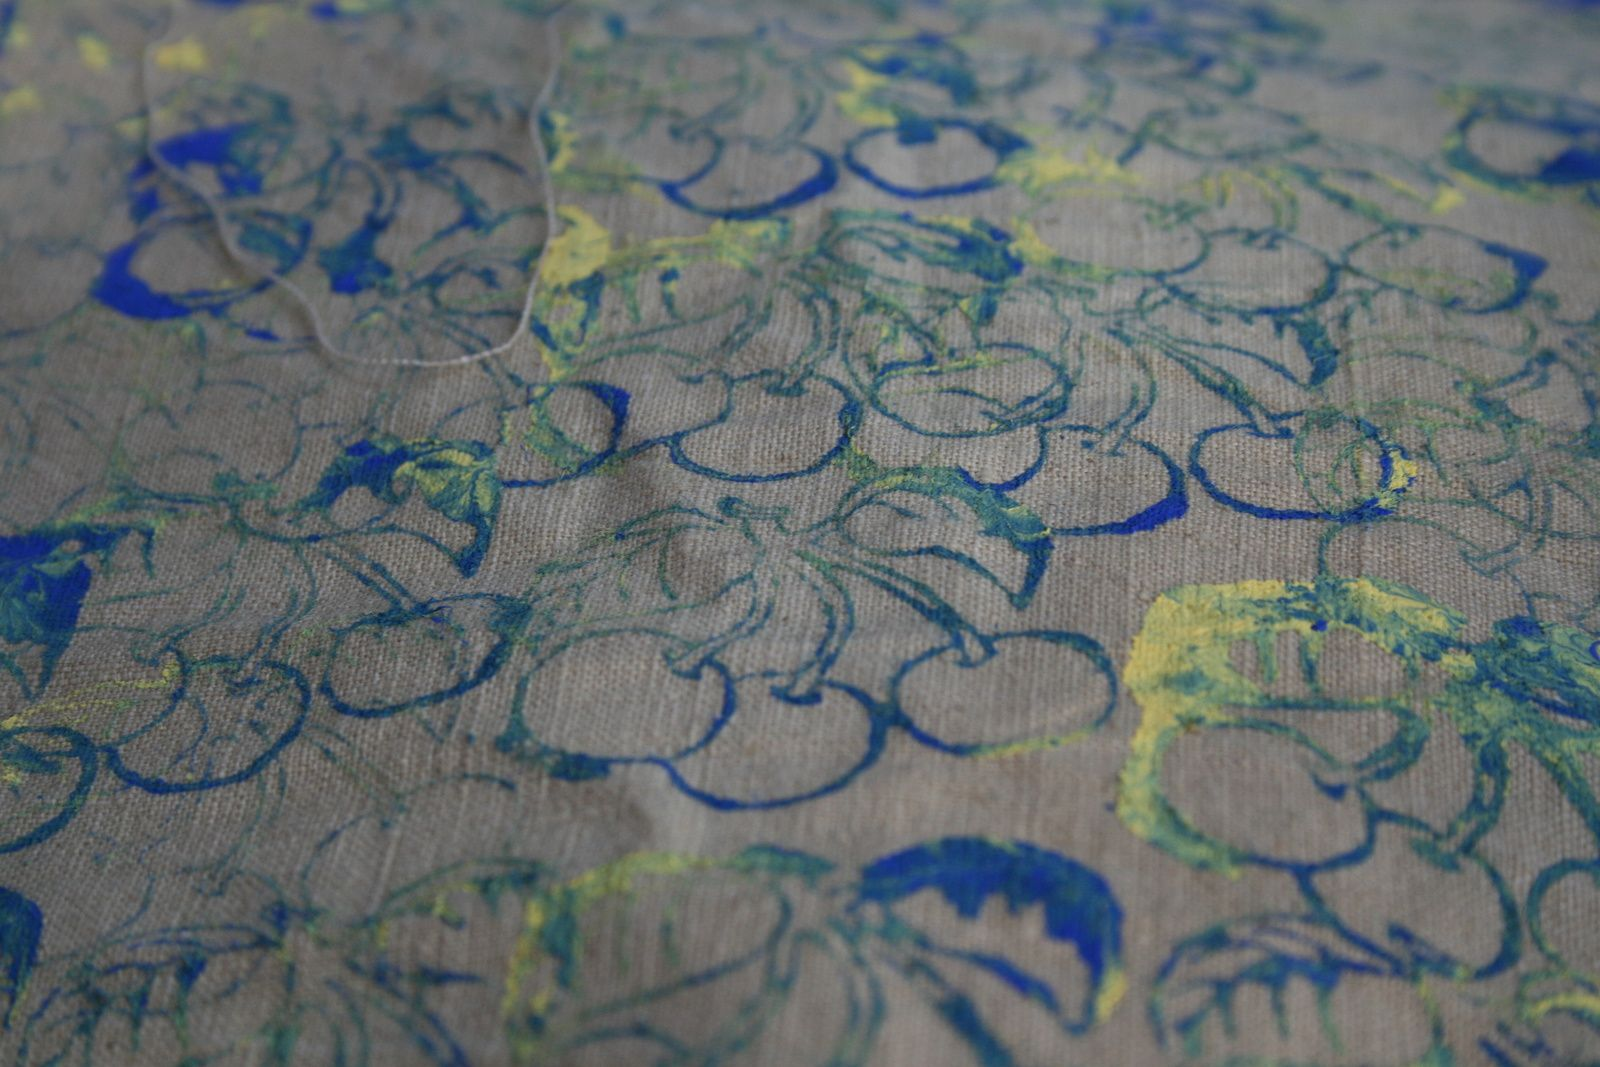 fabrication 'un tote bag ,sac imprime A LA MAIN, DIY- charlotteblabla blog*